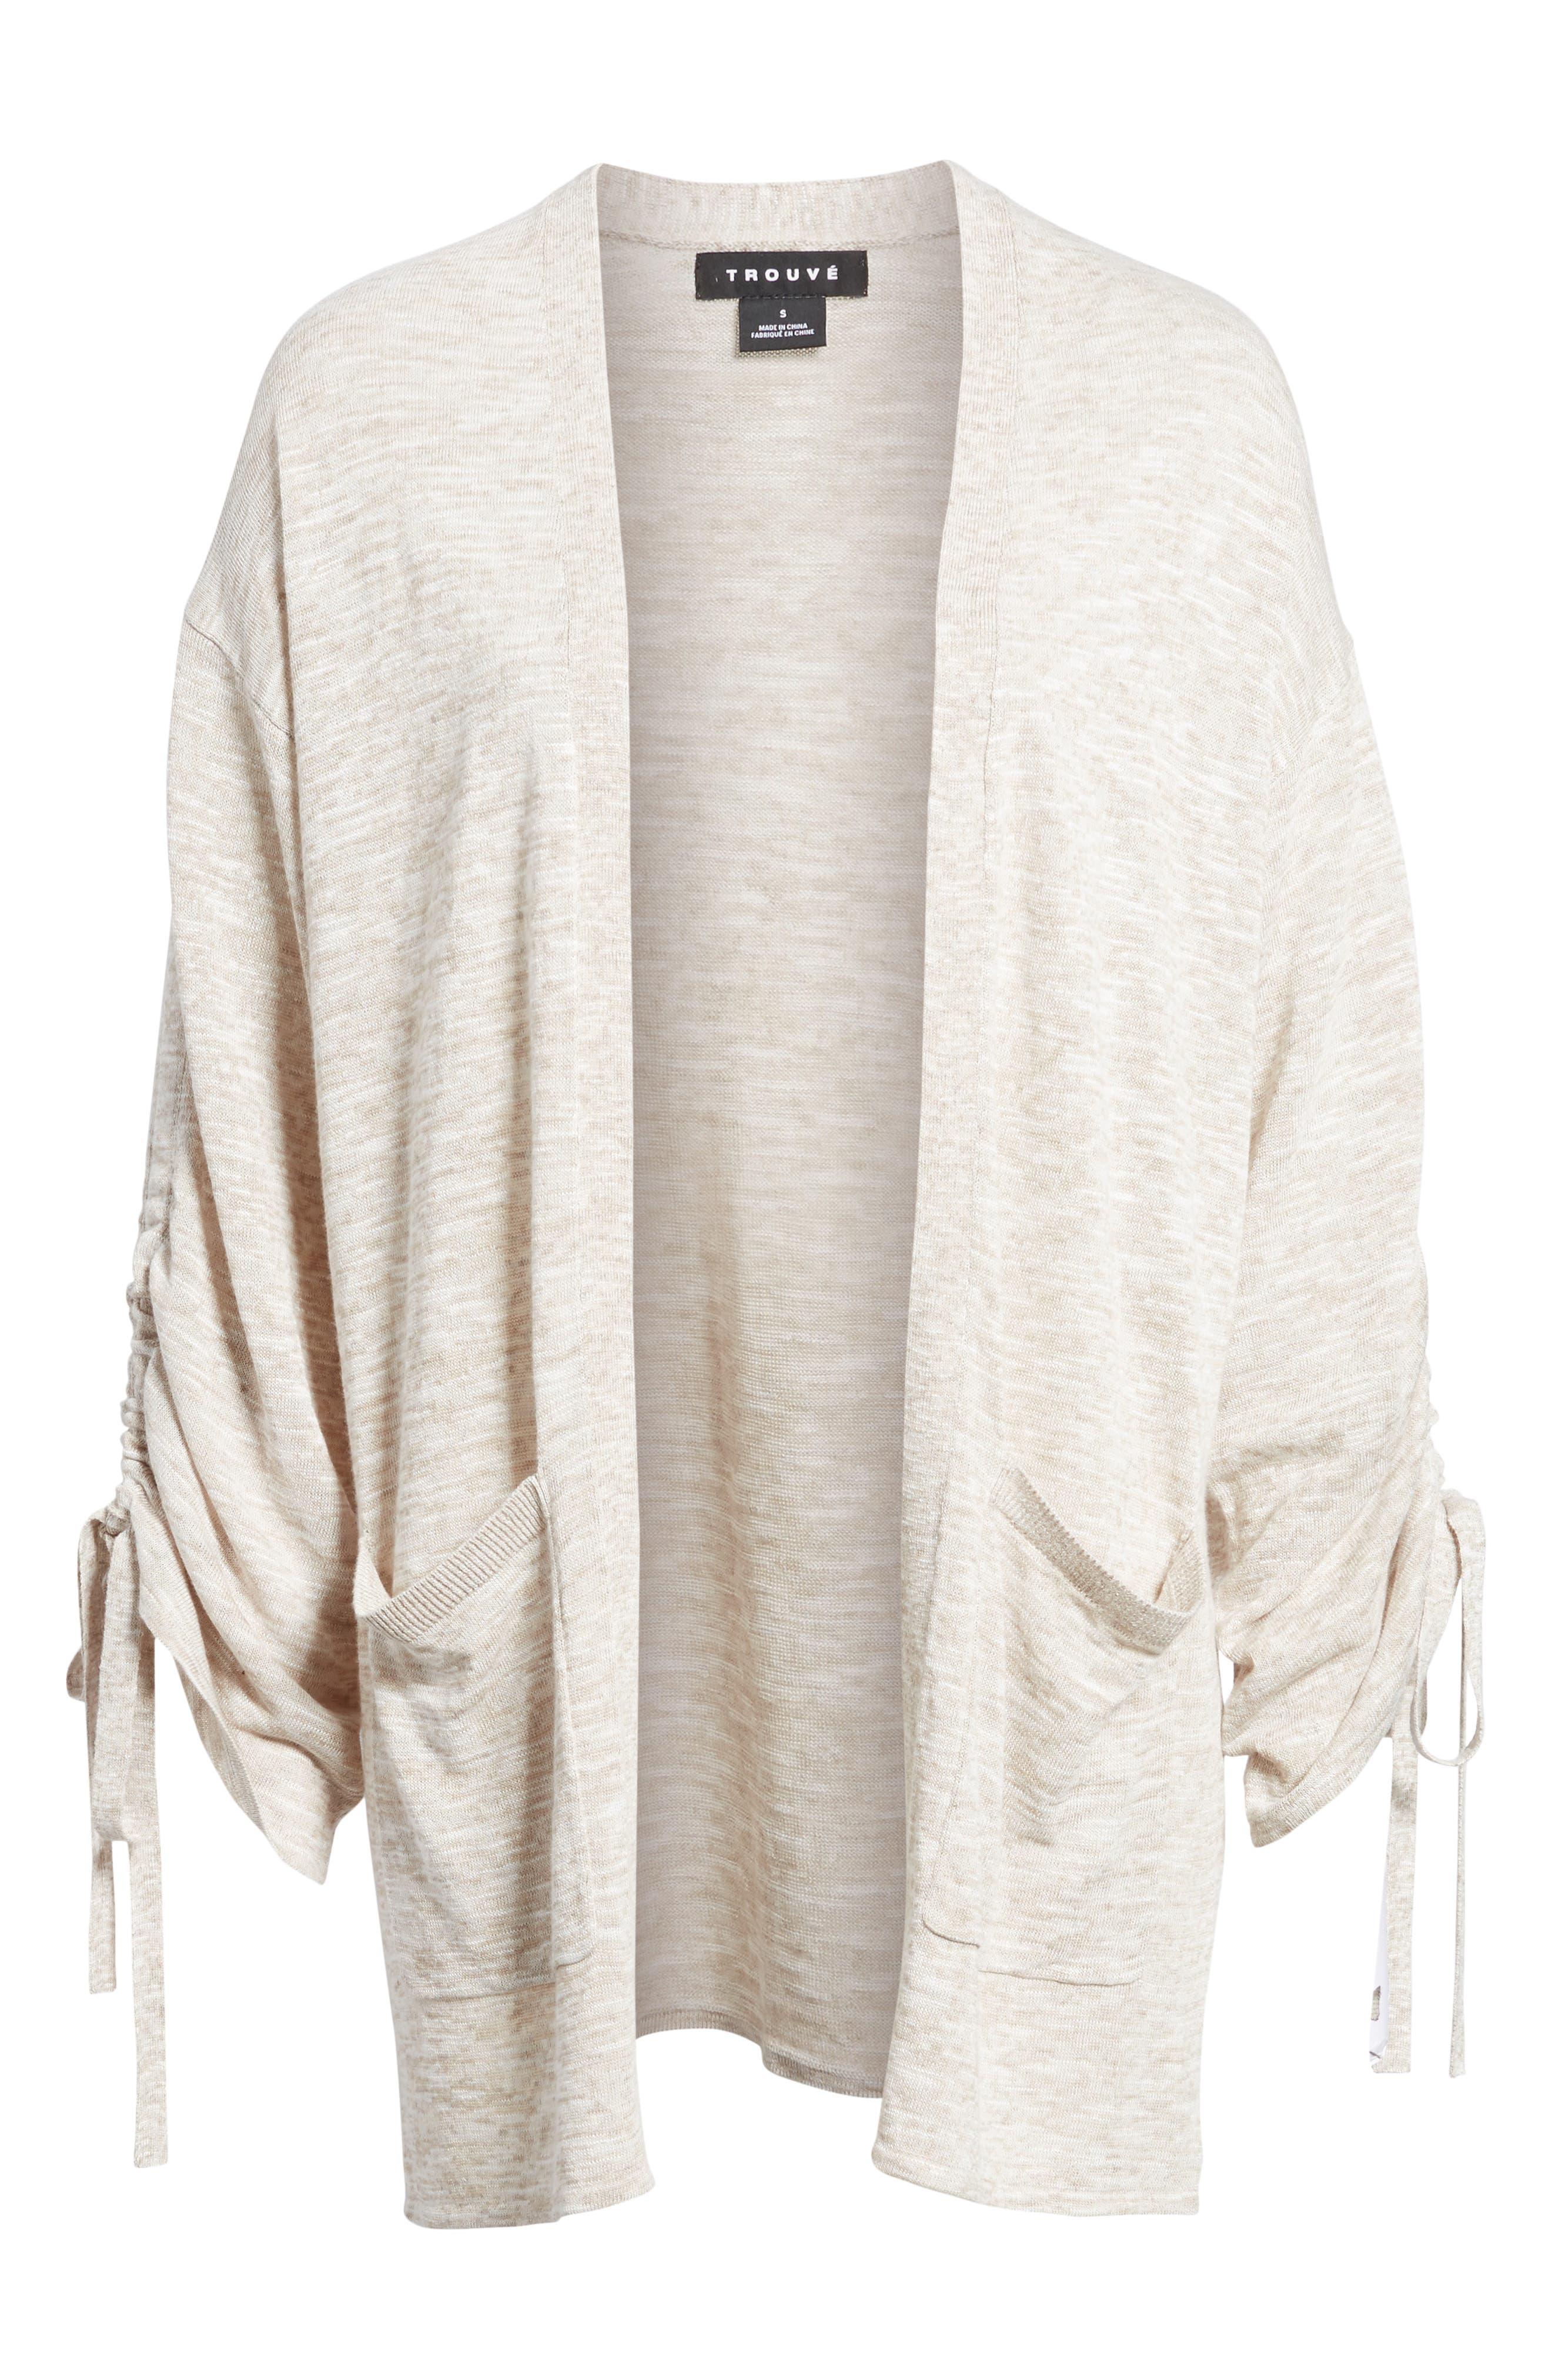 Ruched Sleeve Cardigan,                             Alternate thumbnail 6, color,                             Beige Linen- White Slubs